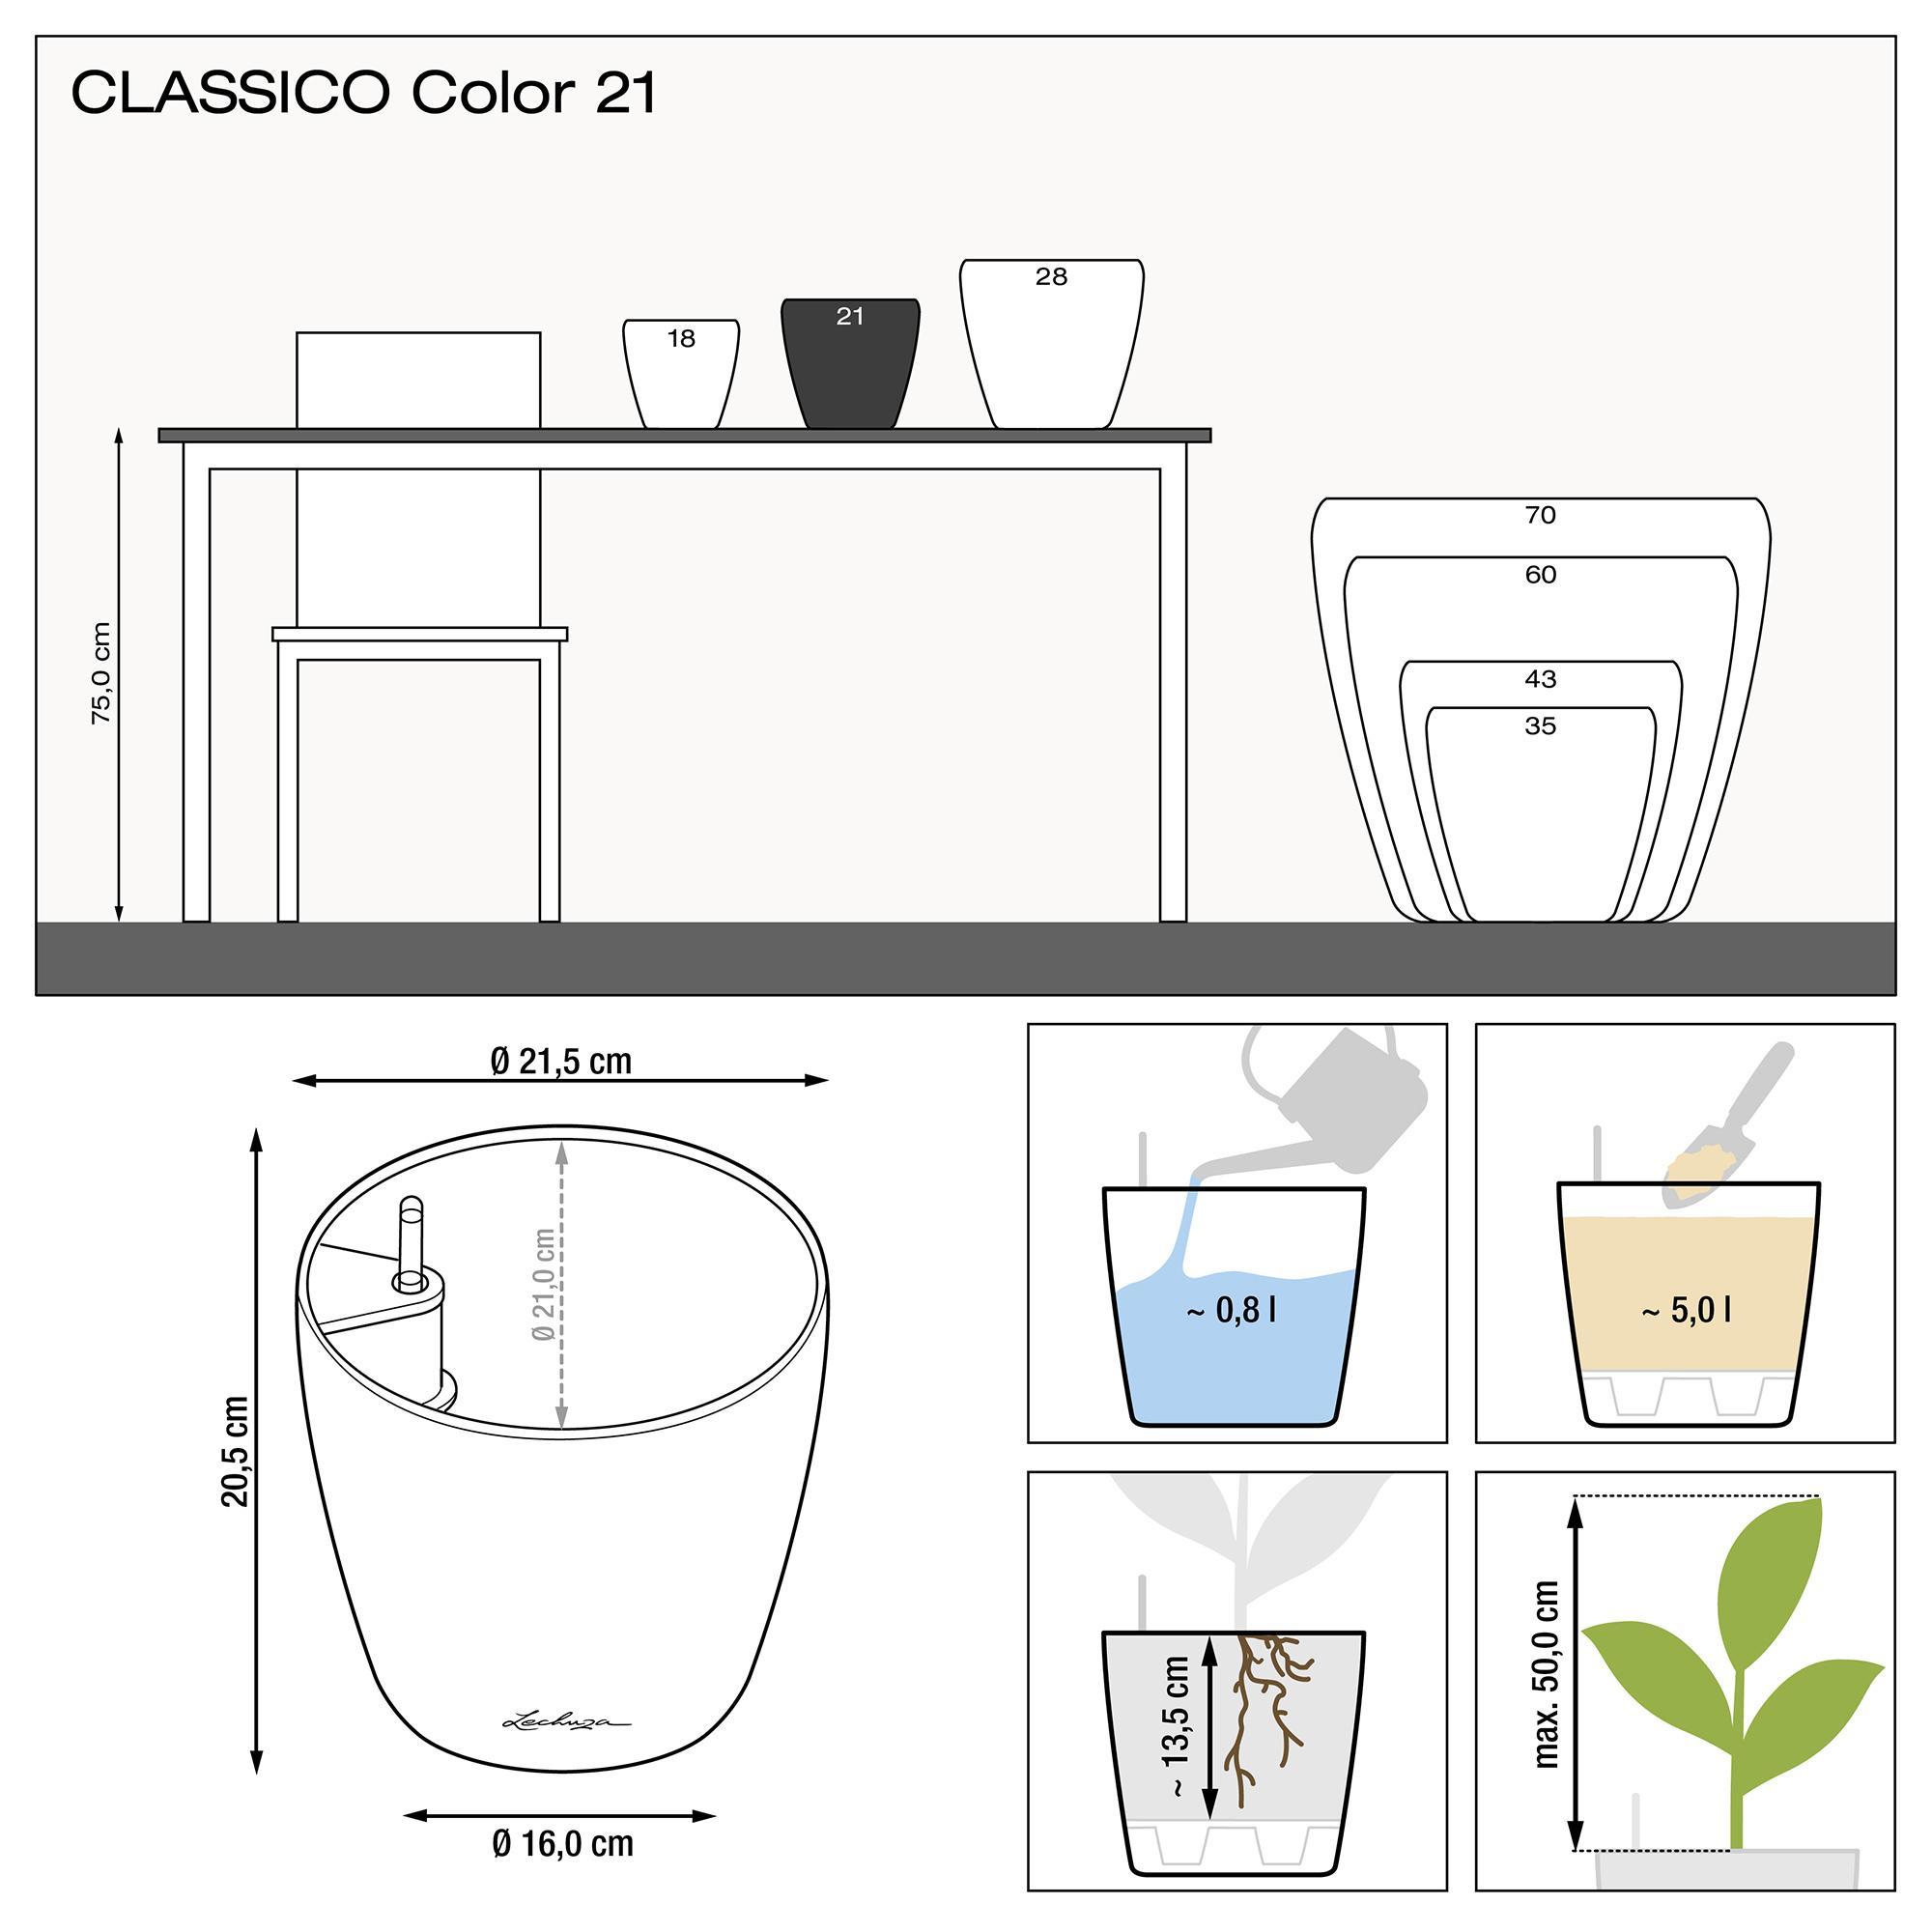 CLASSICO Color 21 weiß - Bild 2